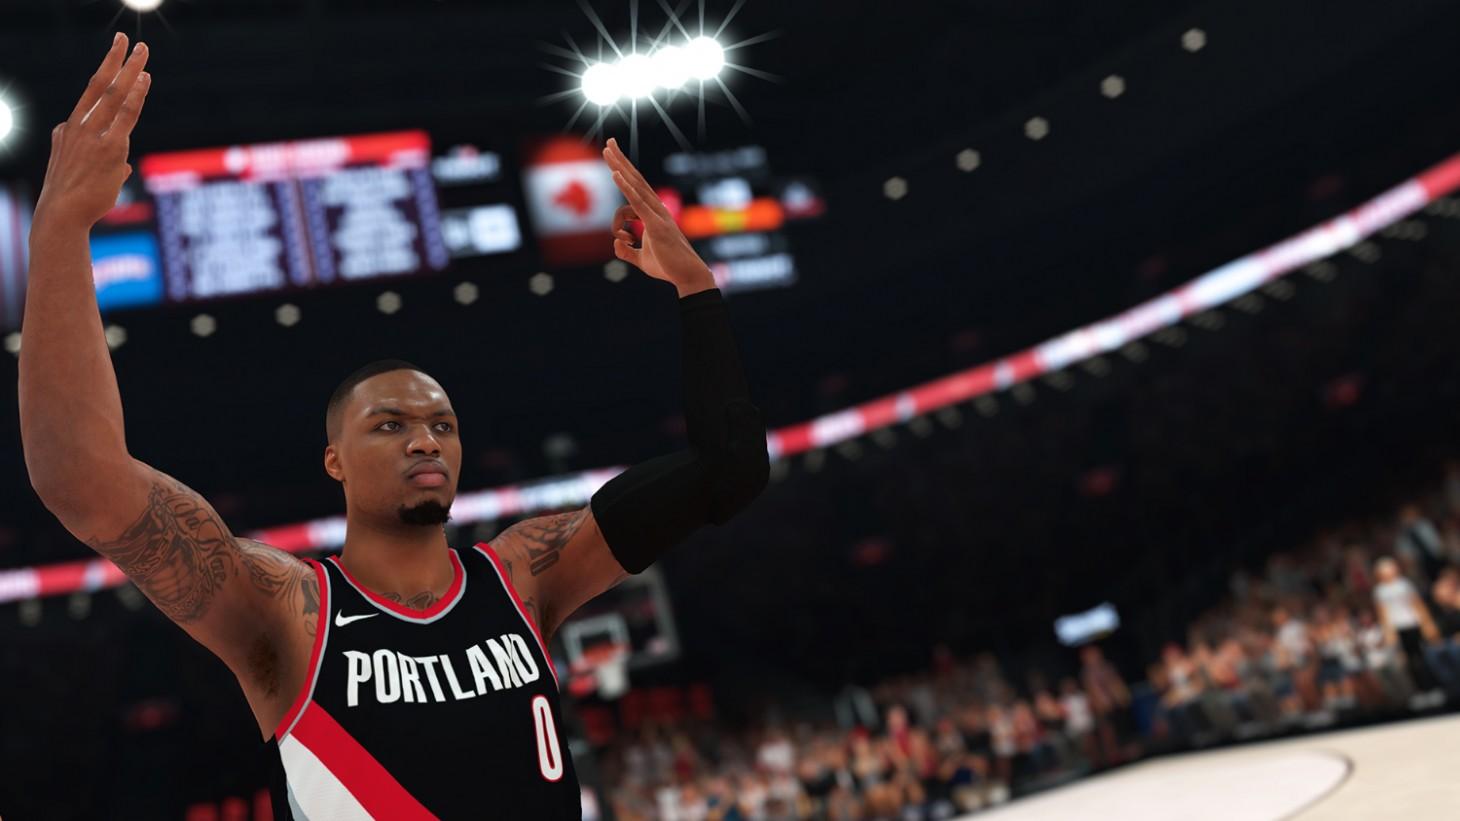 《NBA 2K19》成为系列销量冠军 游戏支出上涨140%